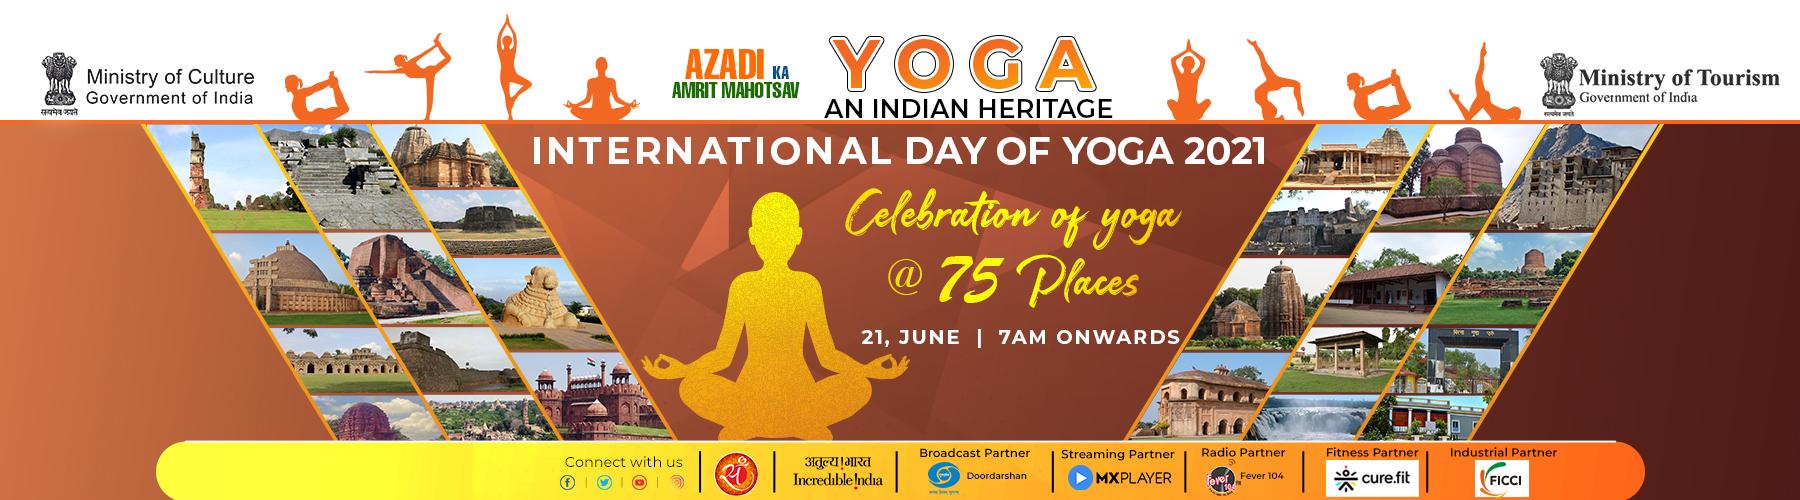 Yoga Day 2021 Website Banner